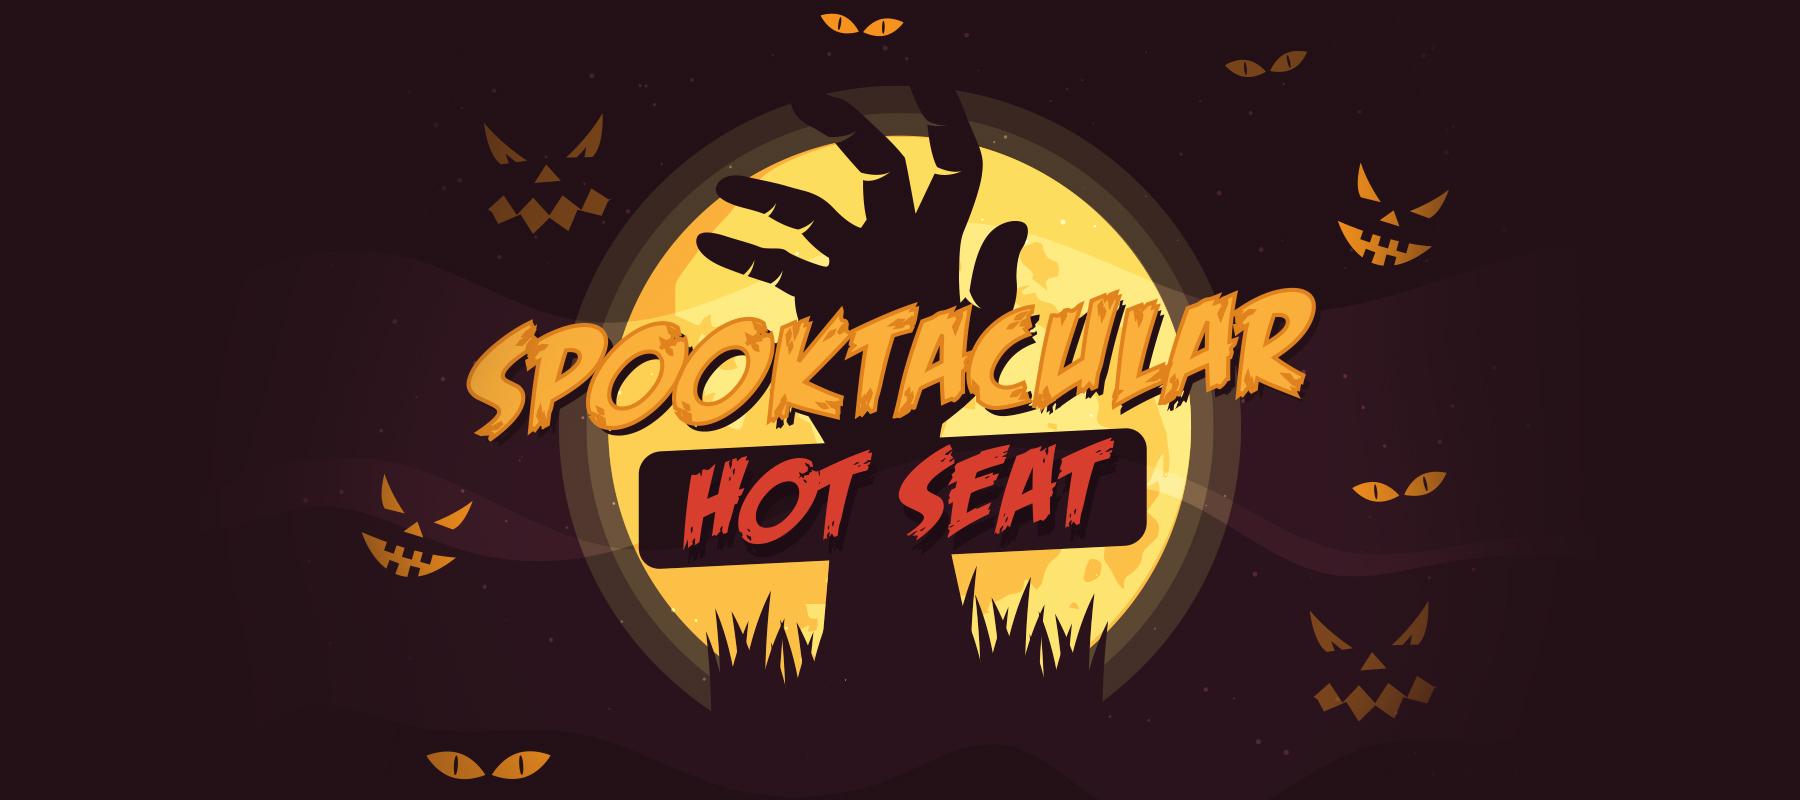 Spooktacular Hot Seat